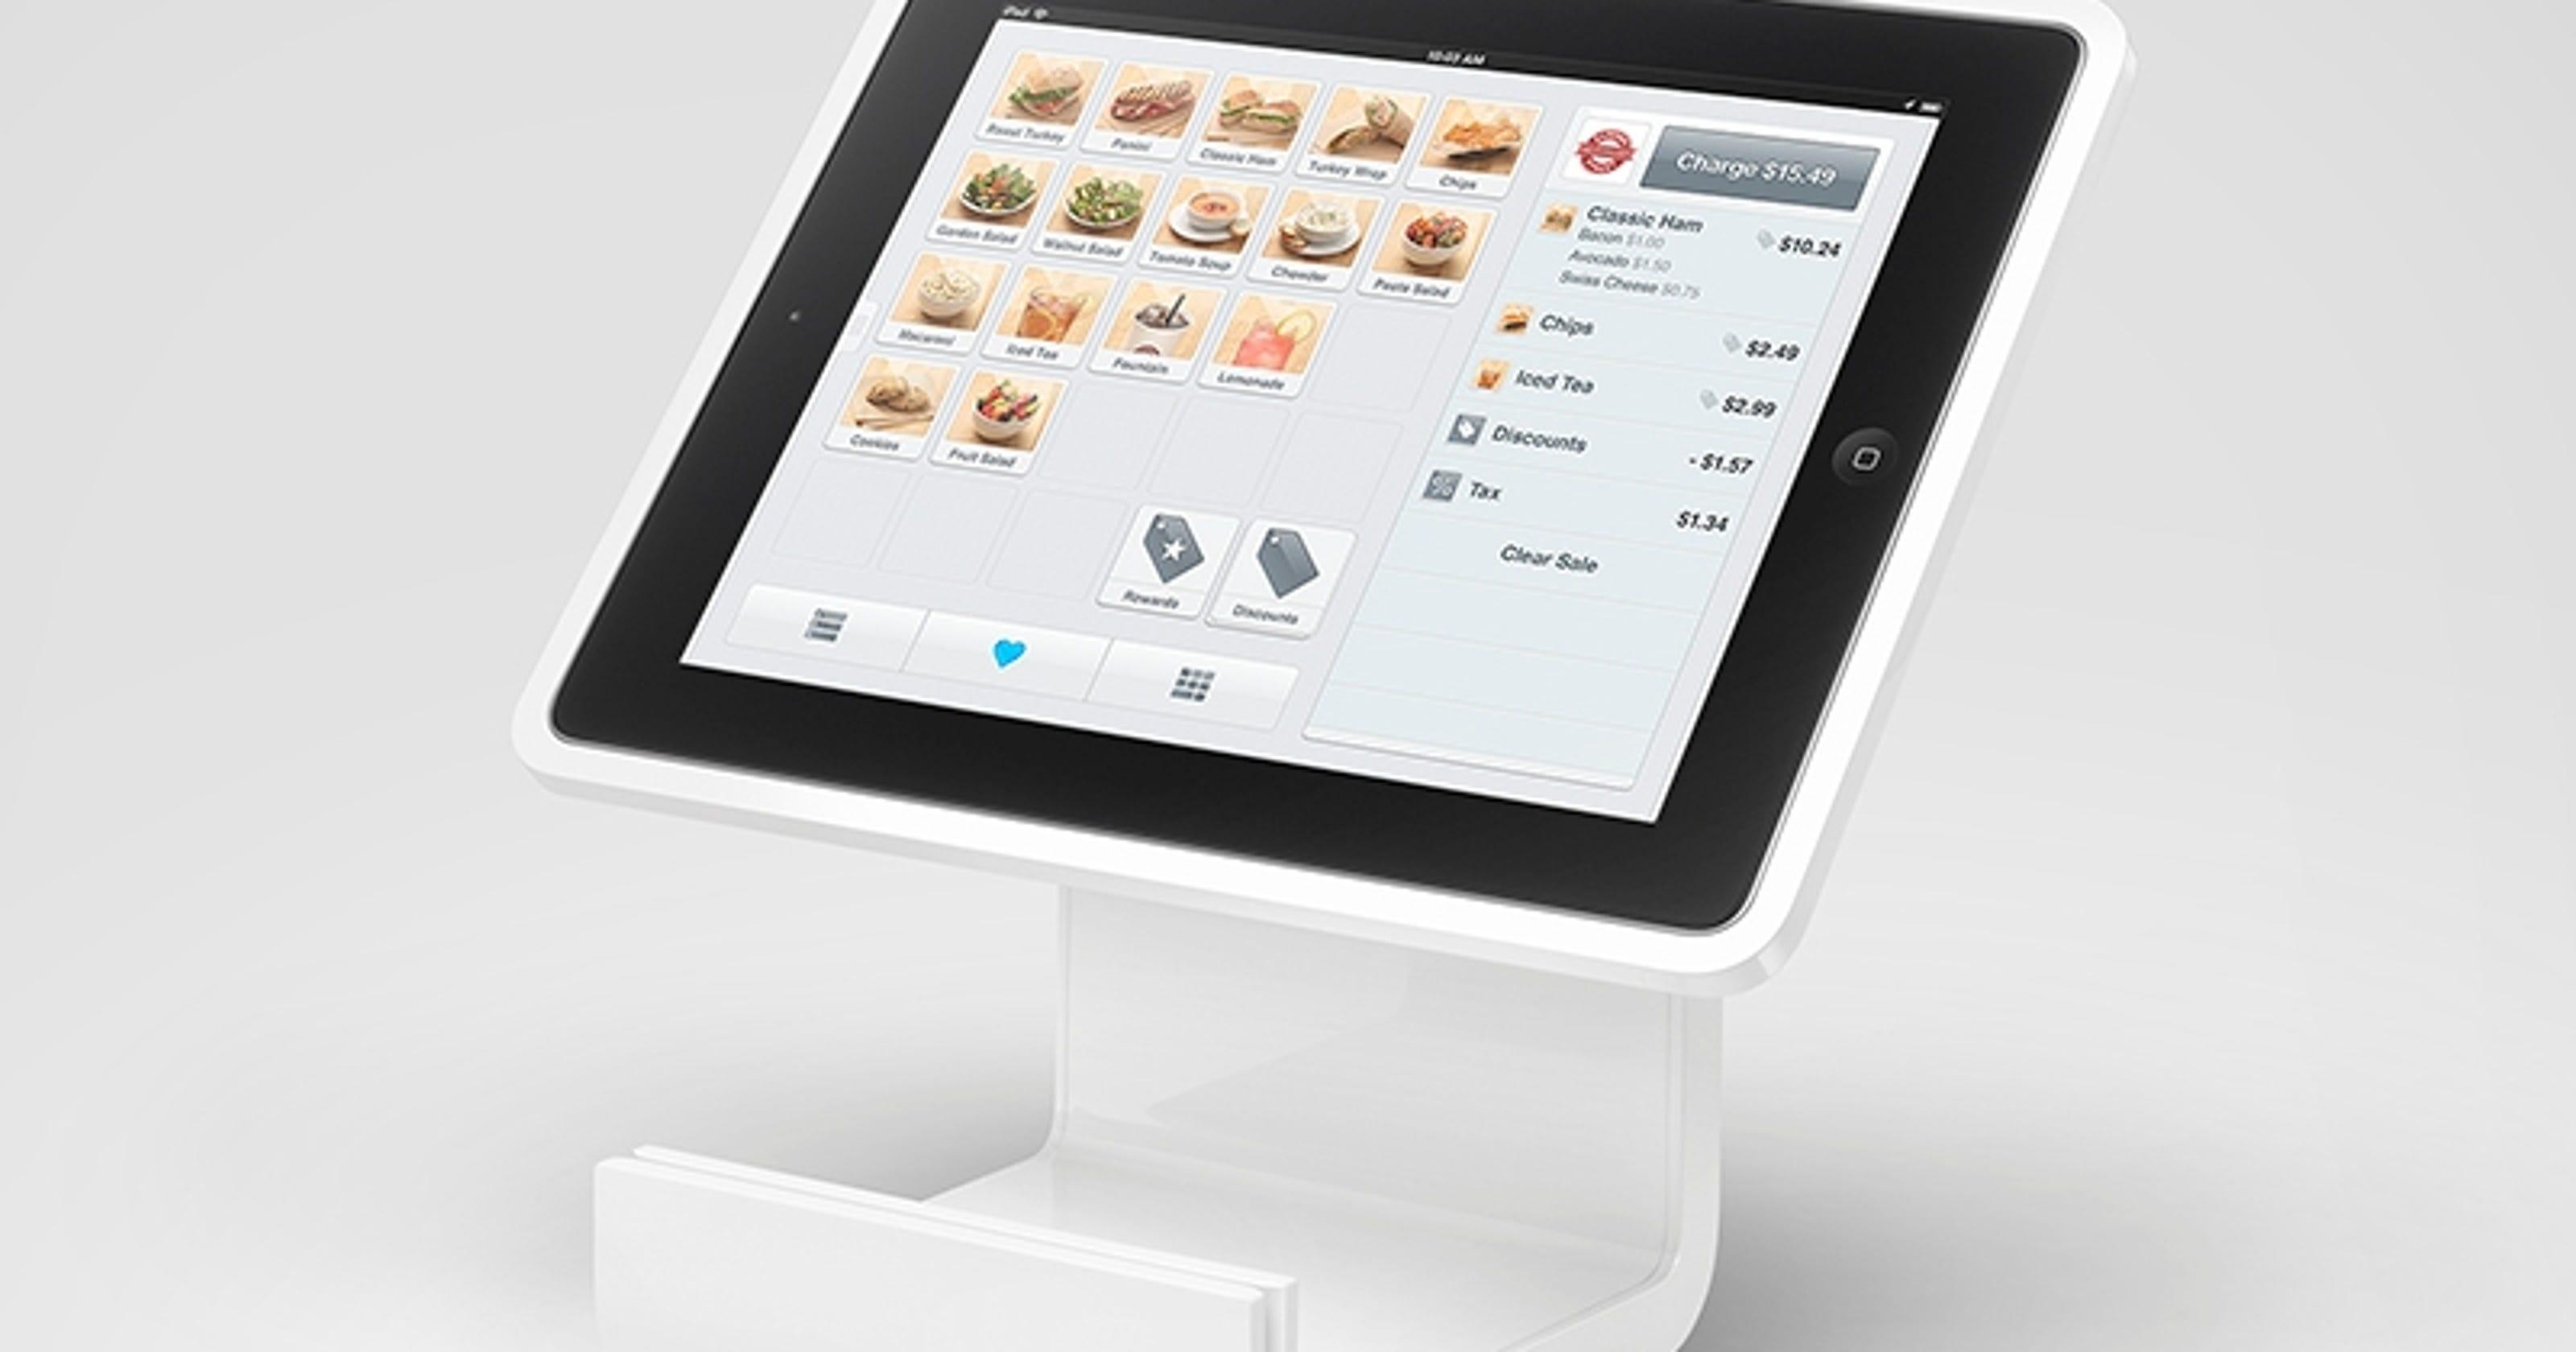 Square Stand Turns Ipad Into Digital Cash Register